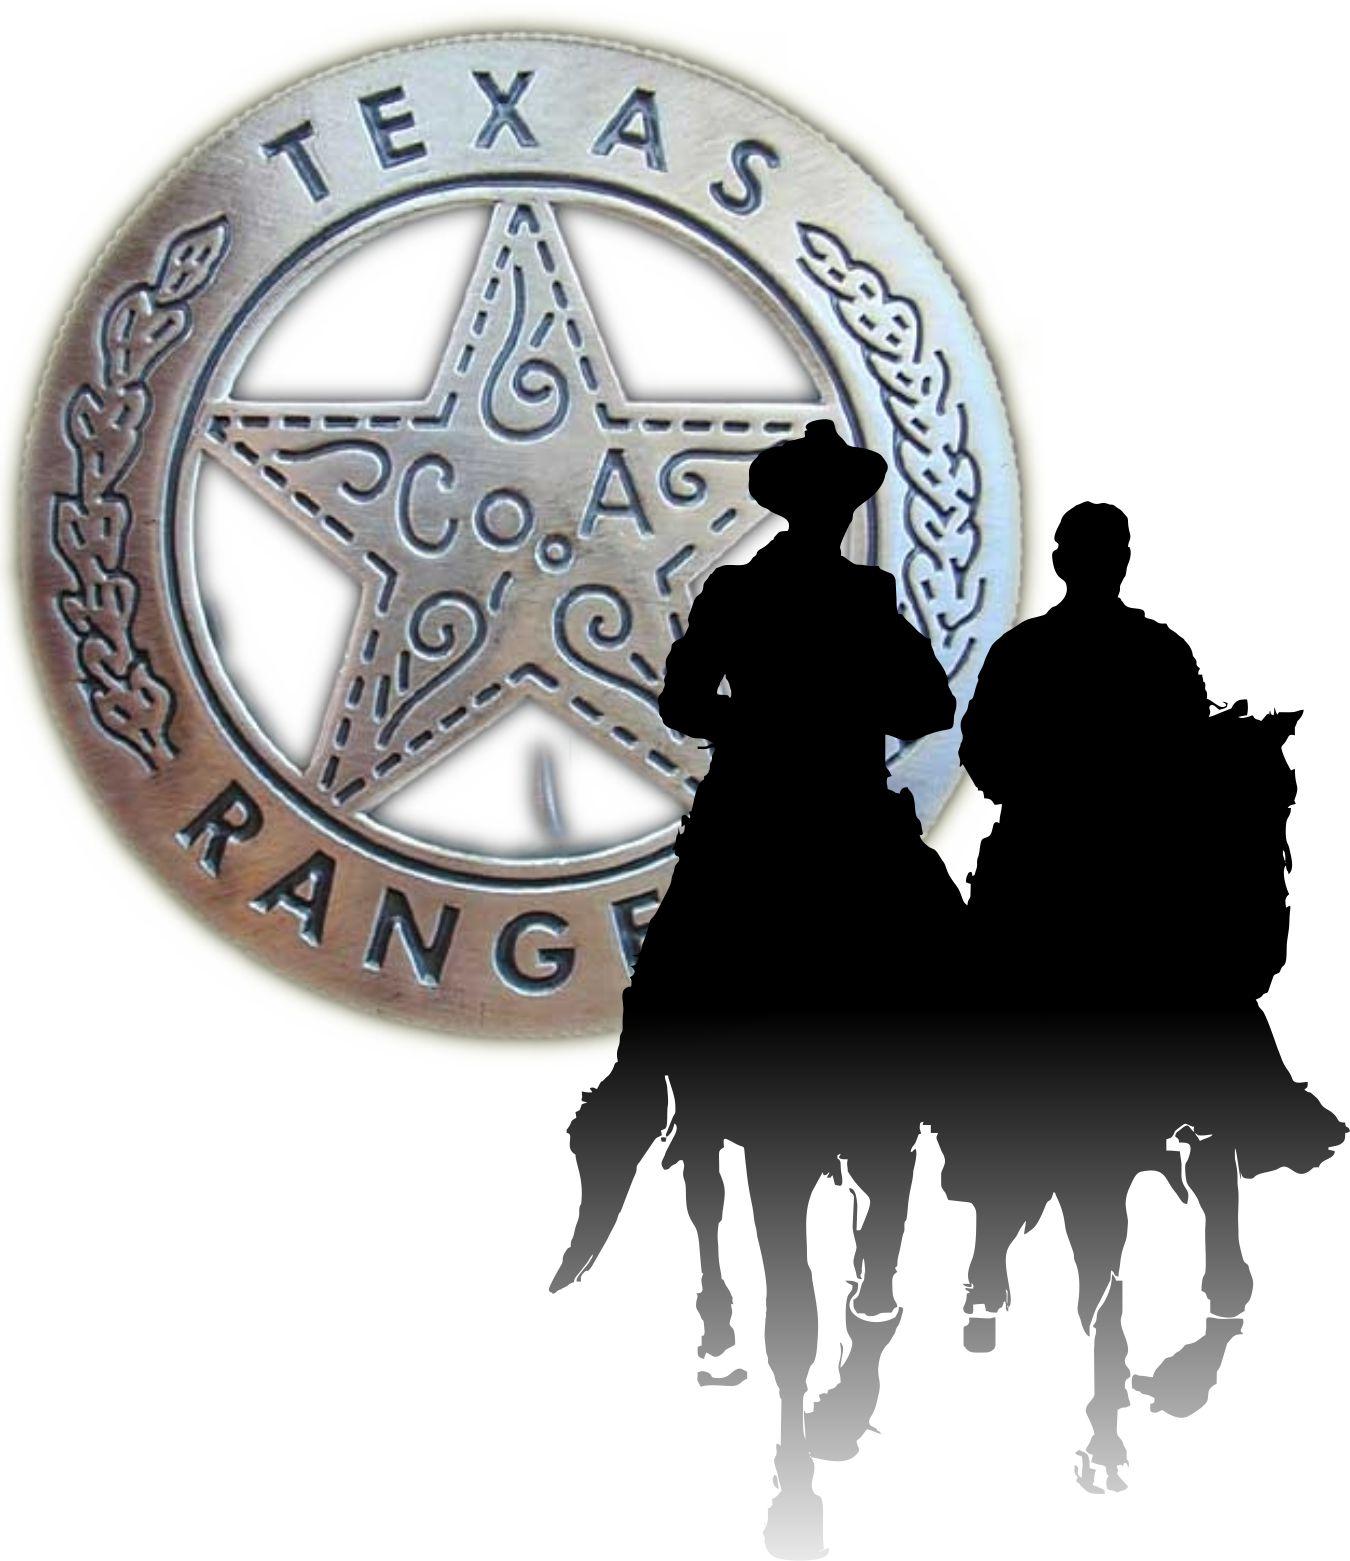 The Lone Ranger Badge My Favorite Westerns